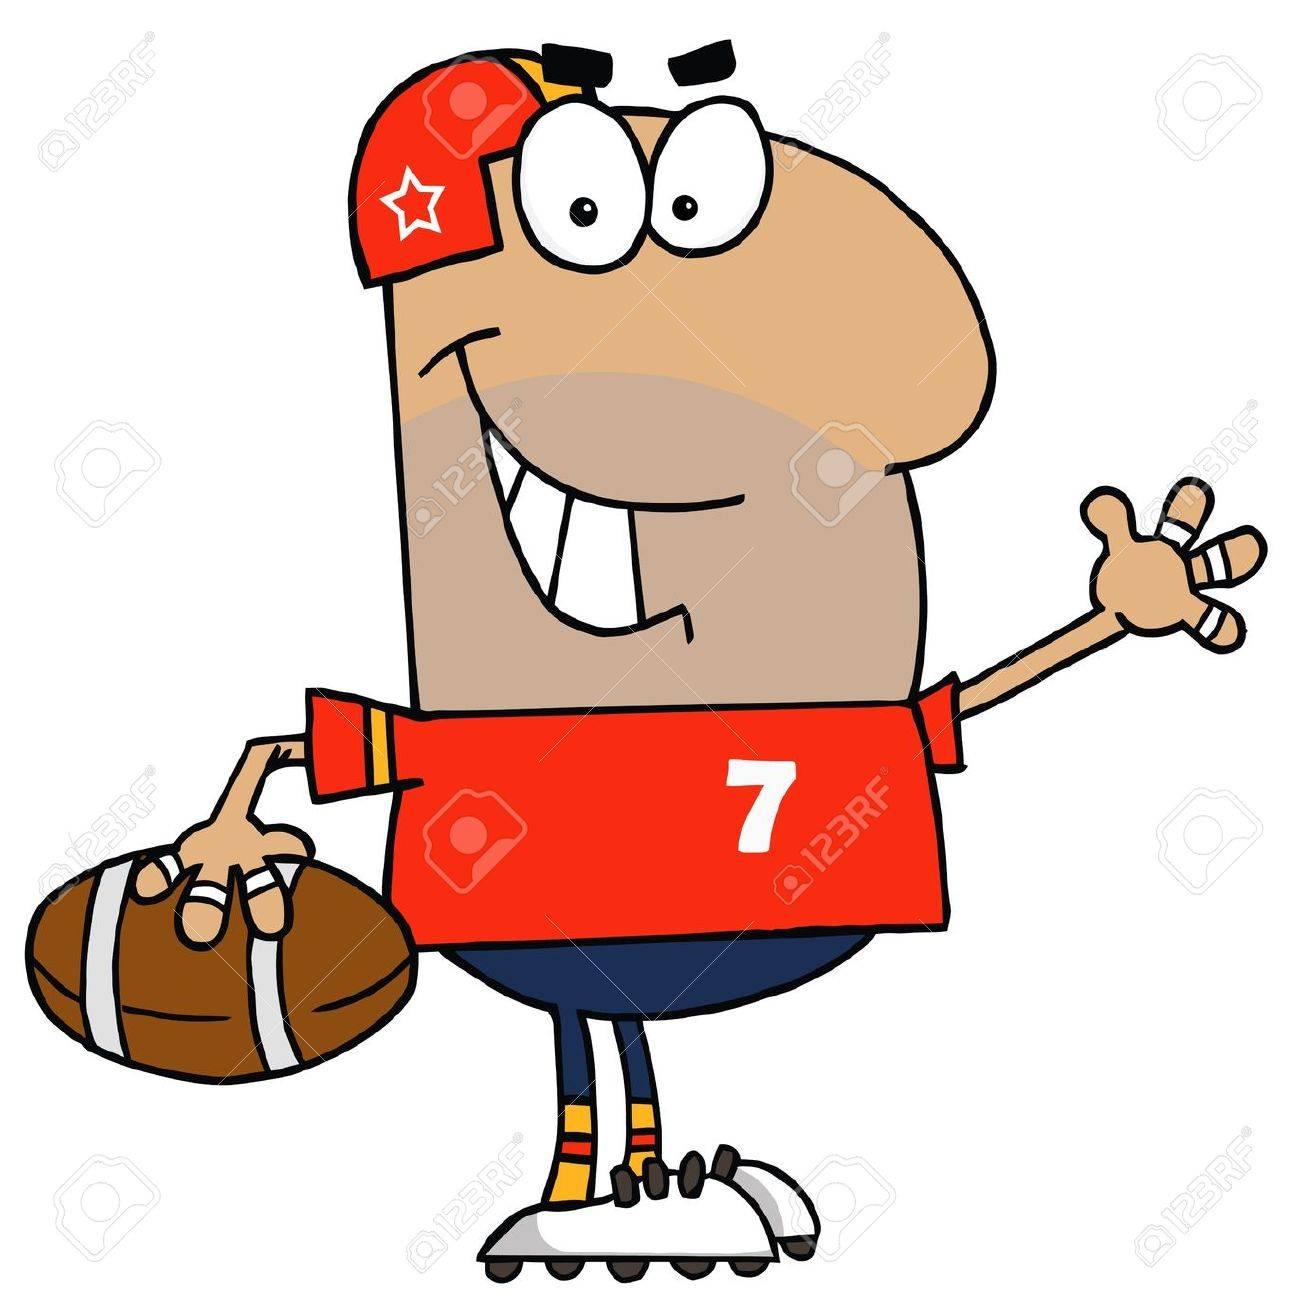 Hispanic Cartoon Footballer Man Stock Vector - 6905679